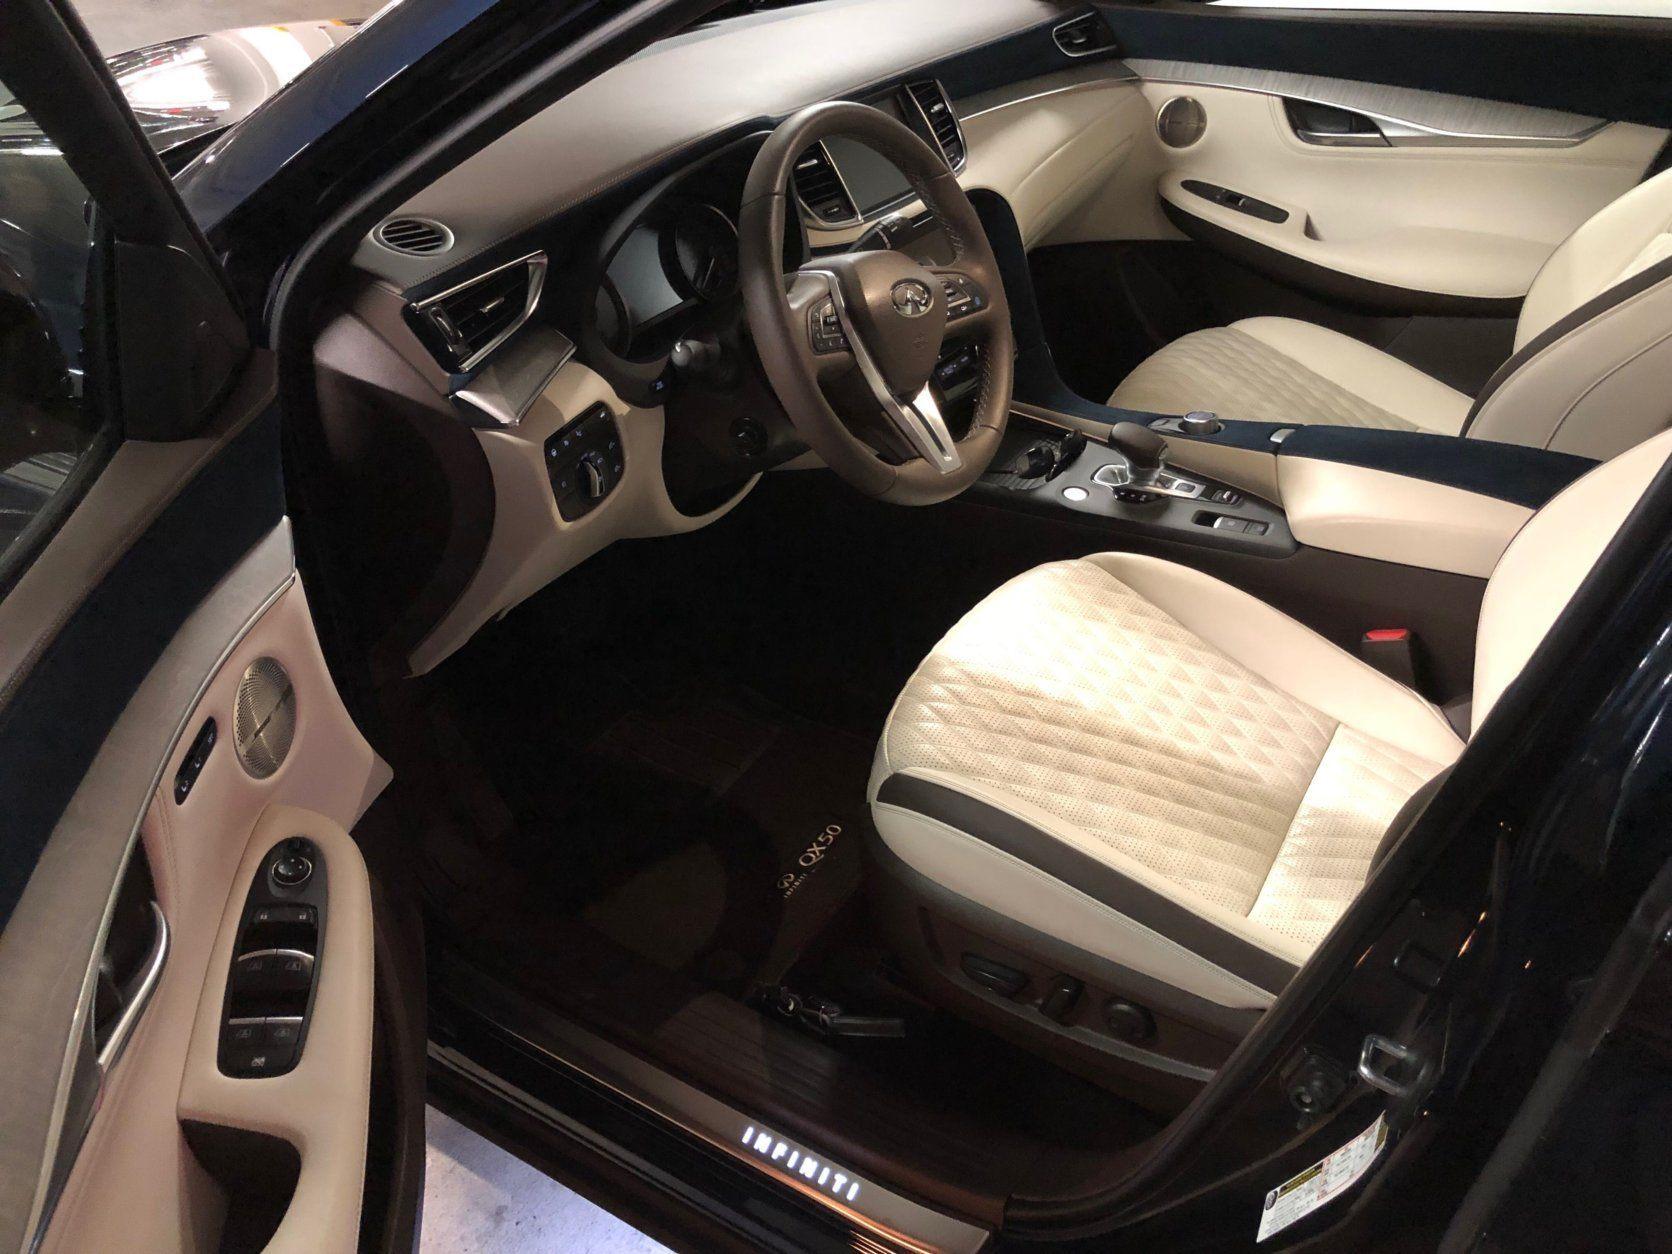 Interior shot of Infiniti QX50